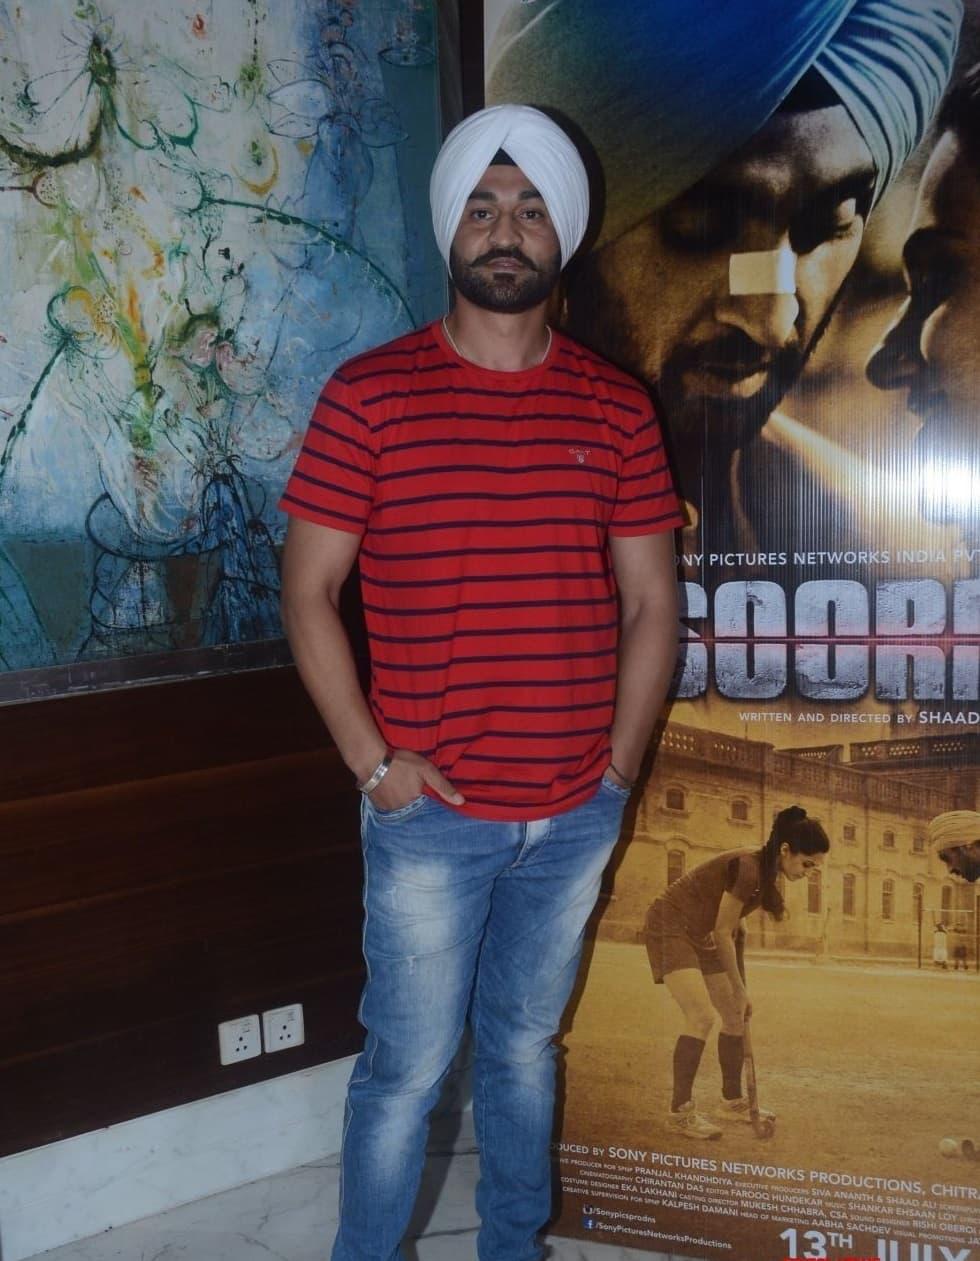 Akshay Kumar Is Too Old To Play Me, Diljit Is Perfect; Says Sandeep Singh